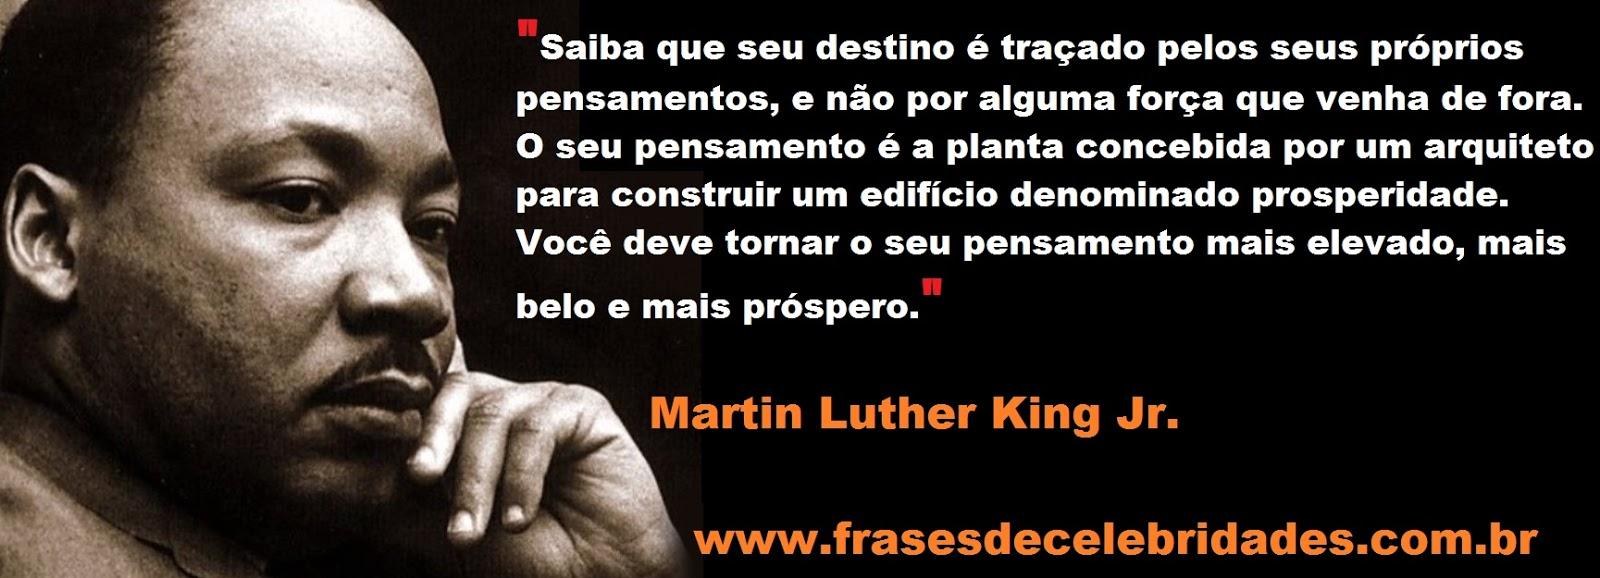 Martin luther king jr religioso